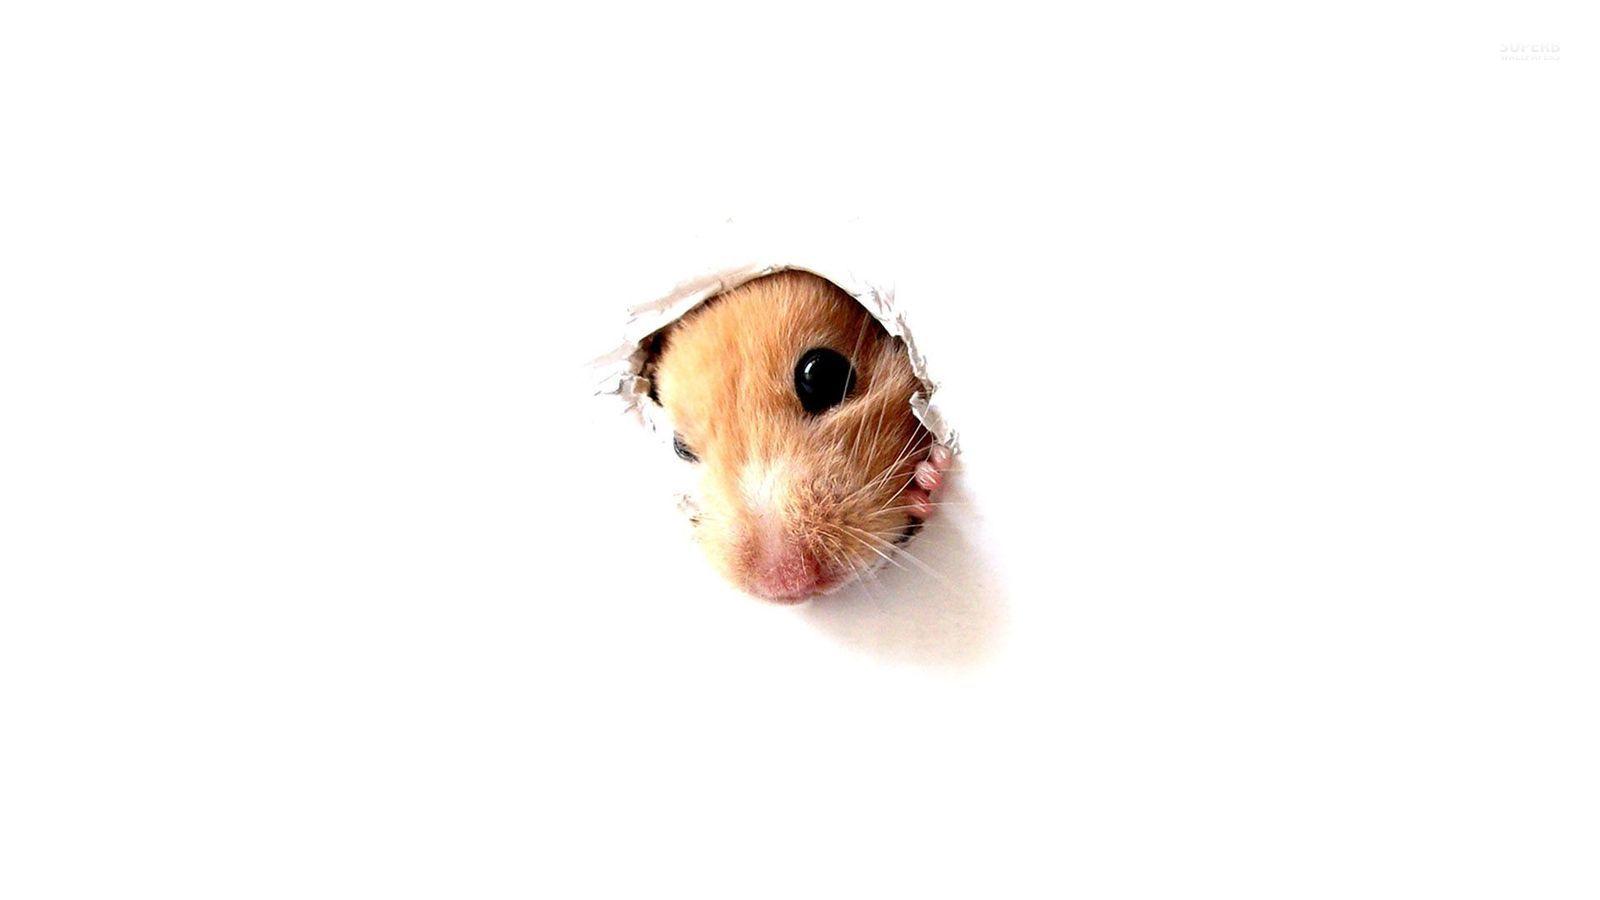 Hamster - Animals Wallpaper (38674650) - Fanpop